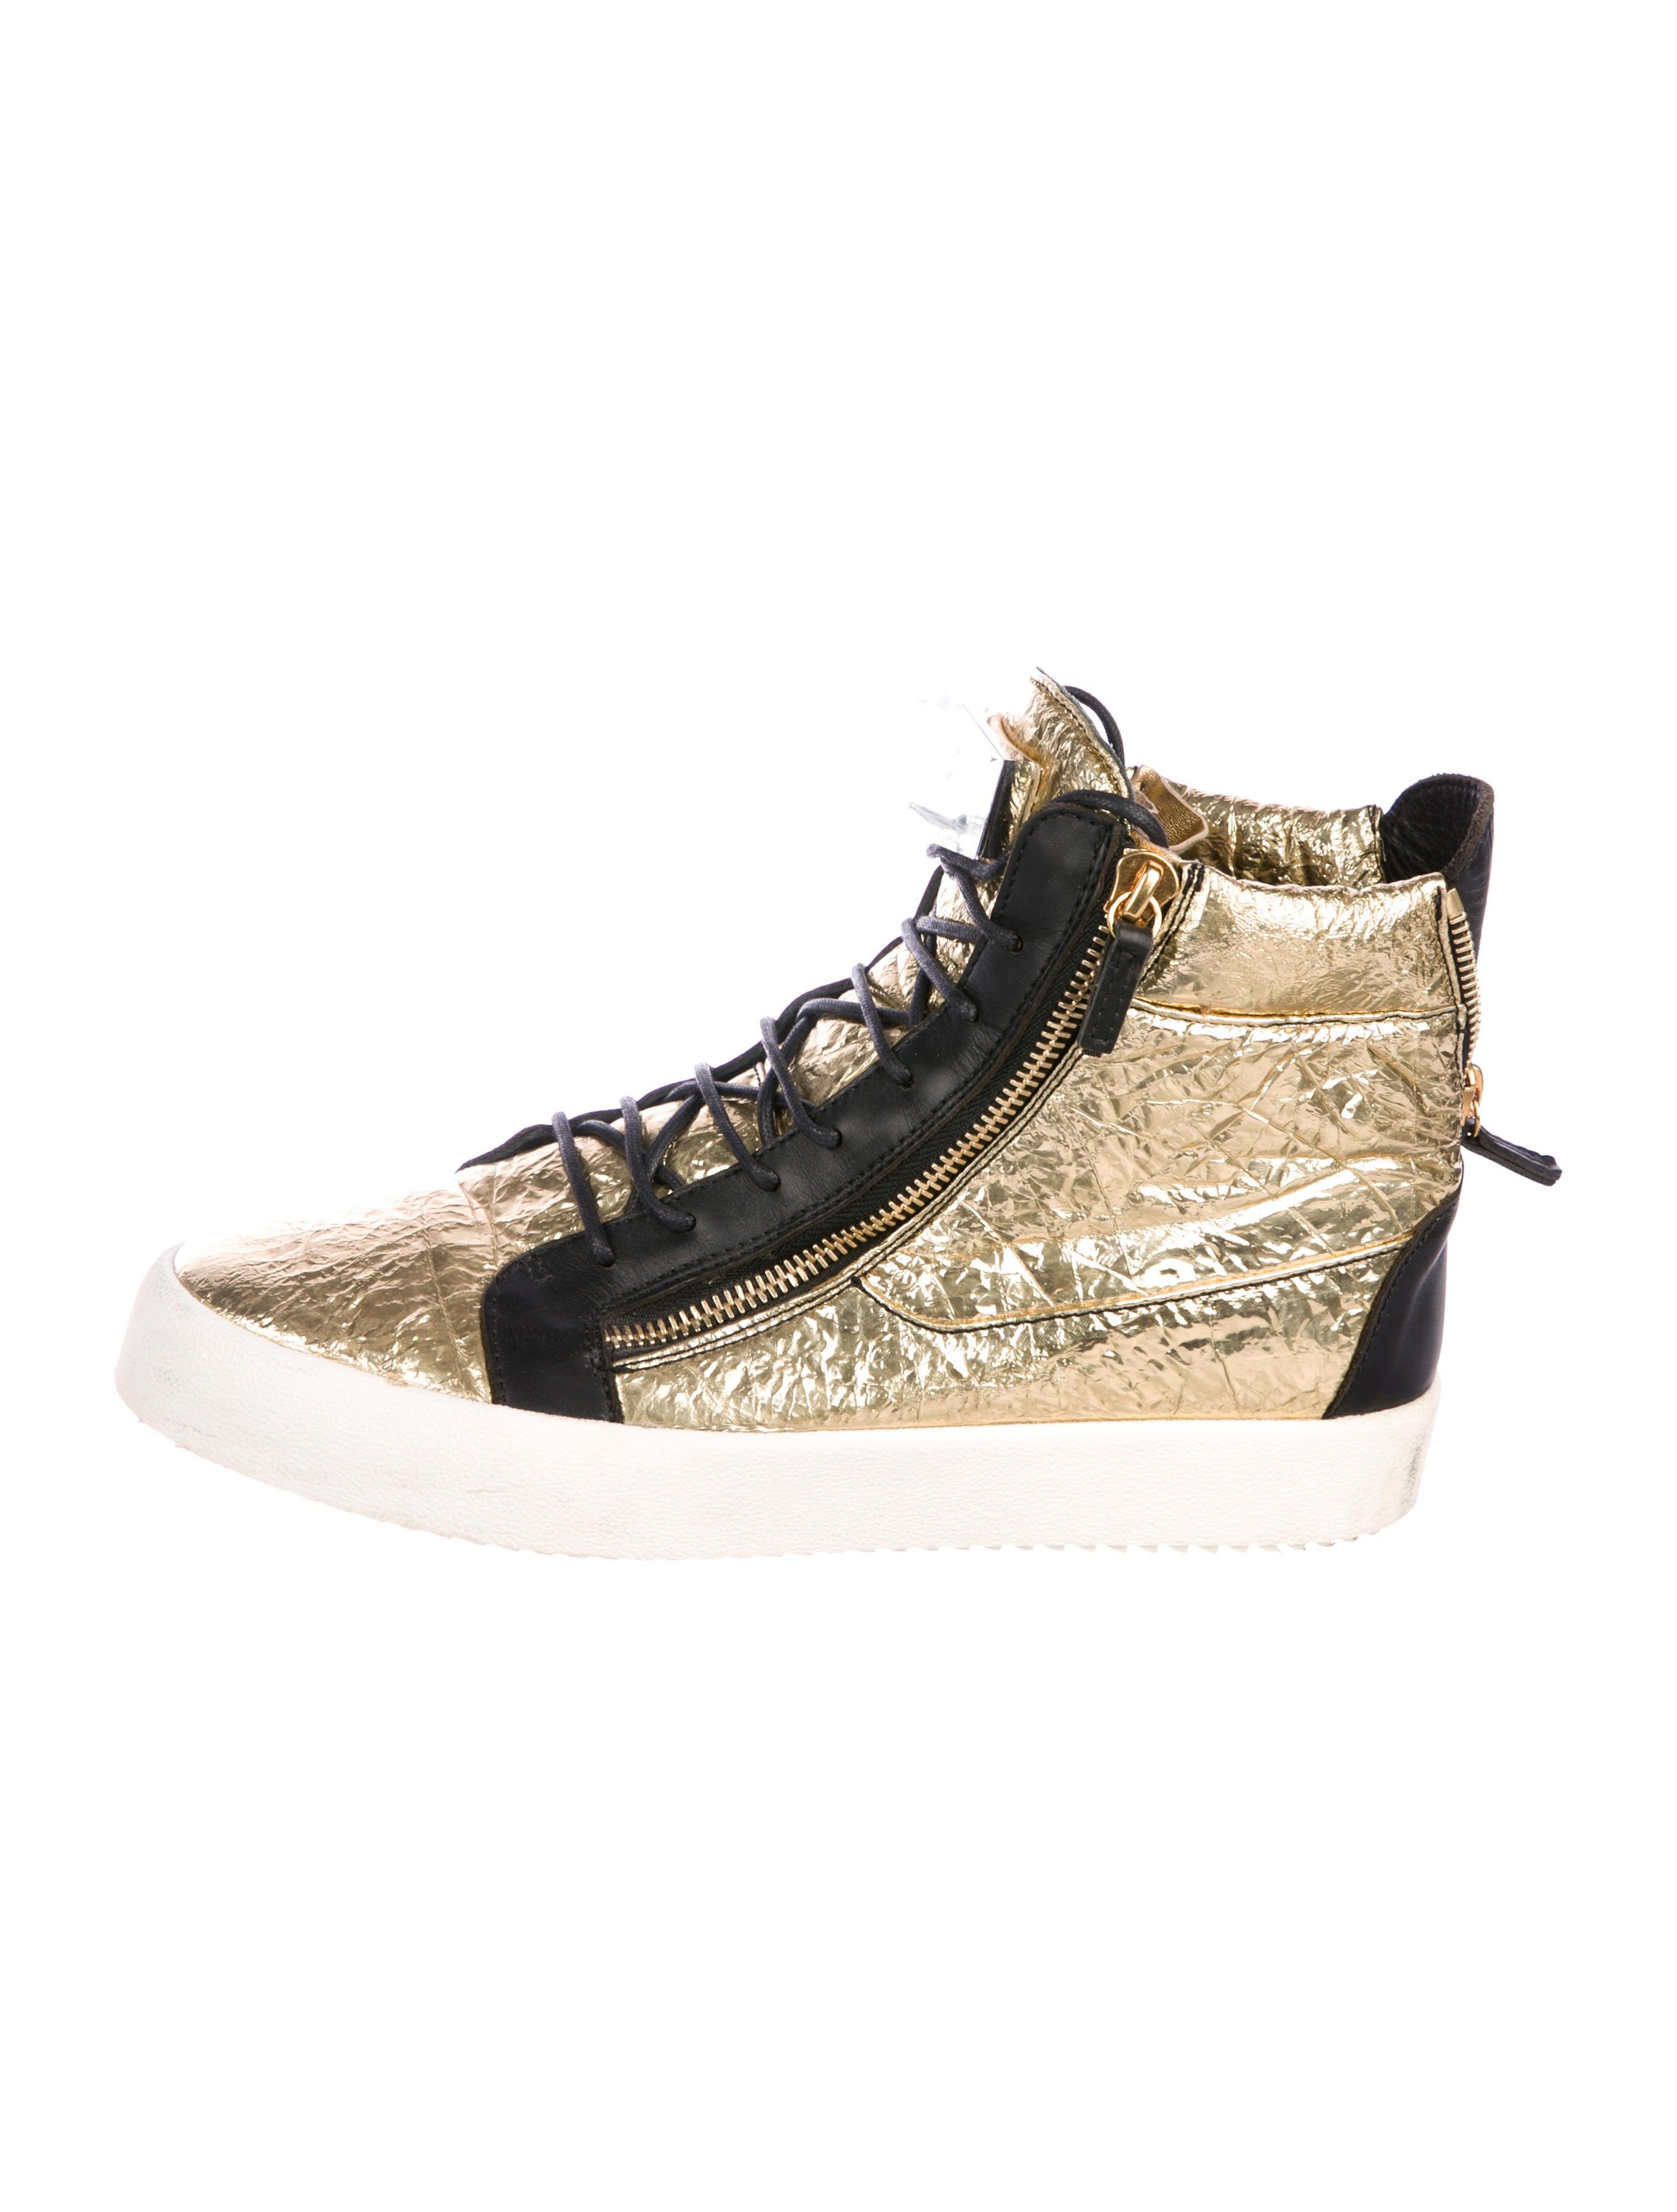 03bc399dc9e03 Giuseppe Zanotti Metallic Foil Sneakers - Shoes - GIU47685 | The ...